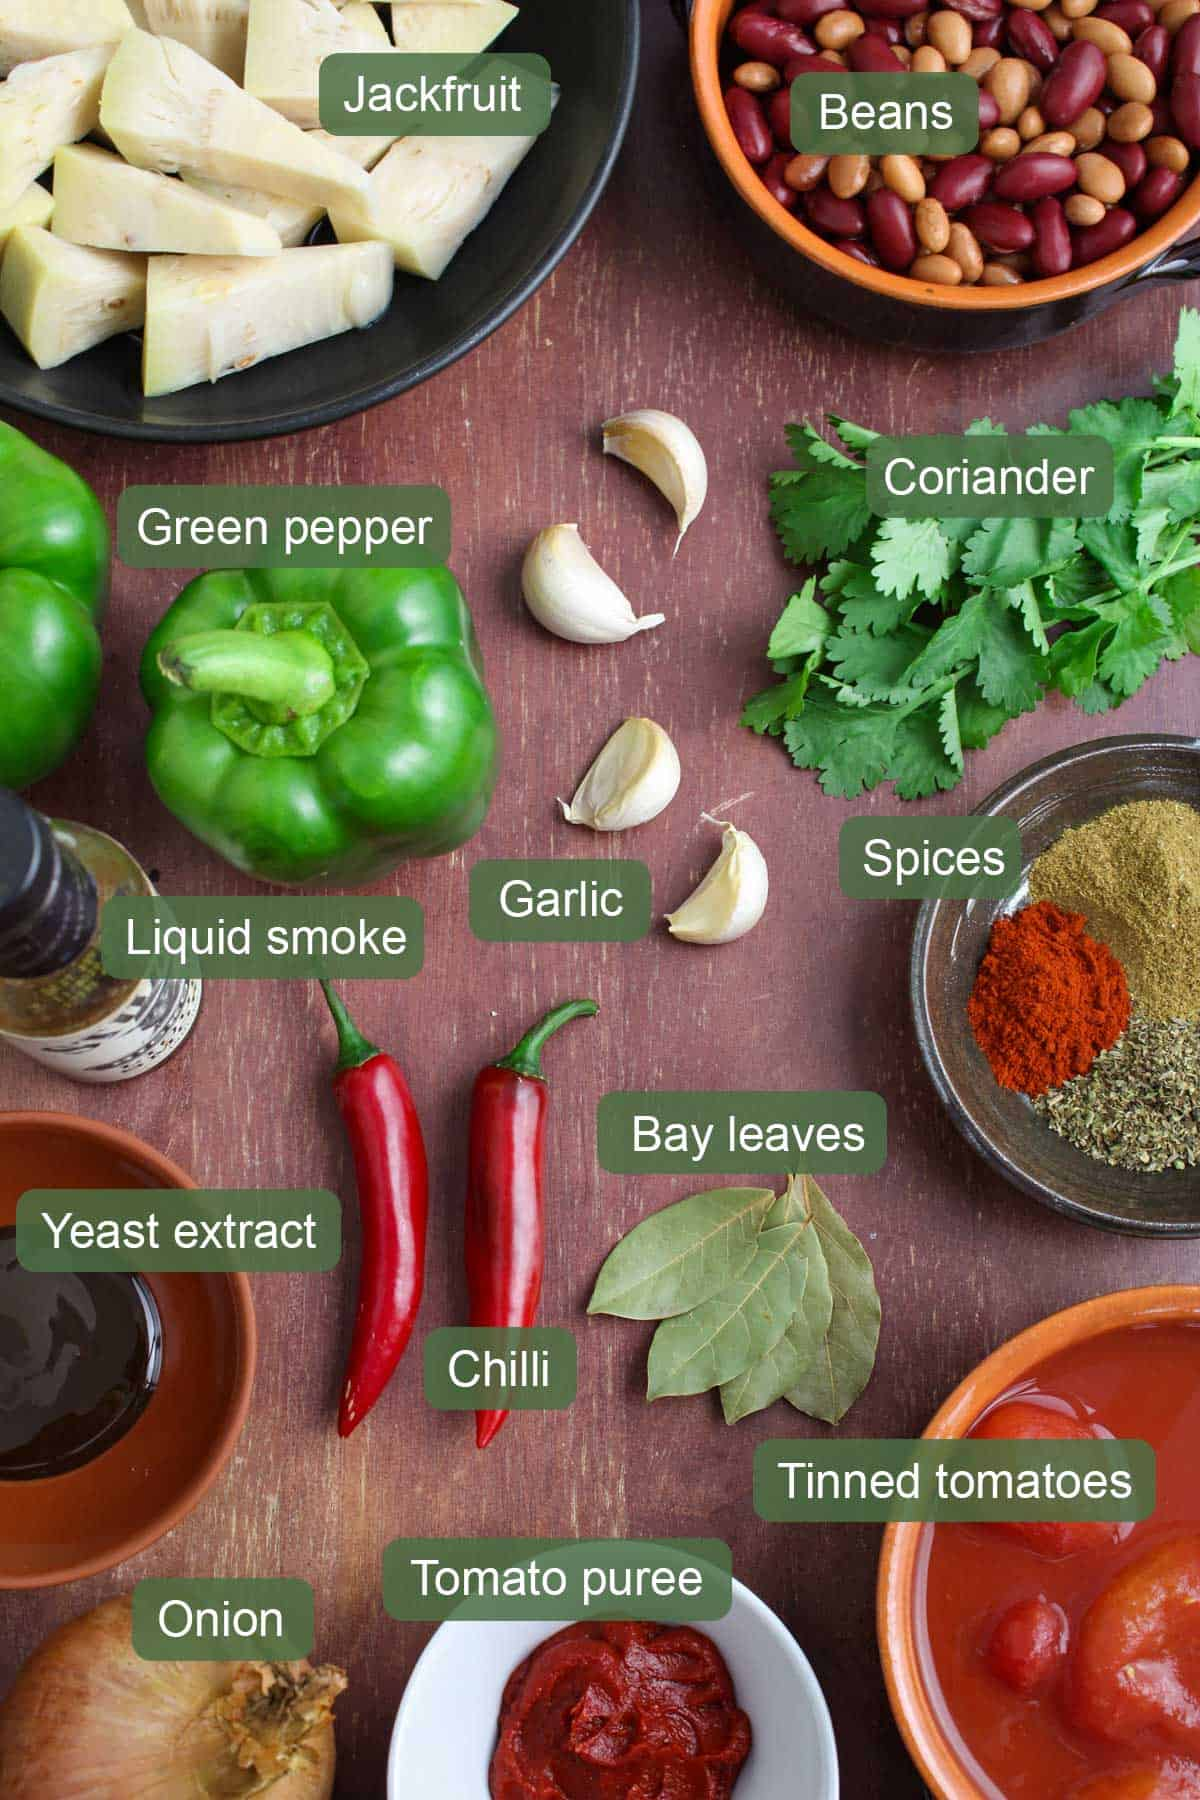 List of Ingredients for Jackfruit Chilli